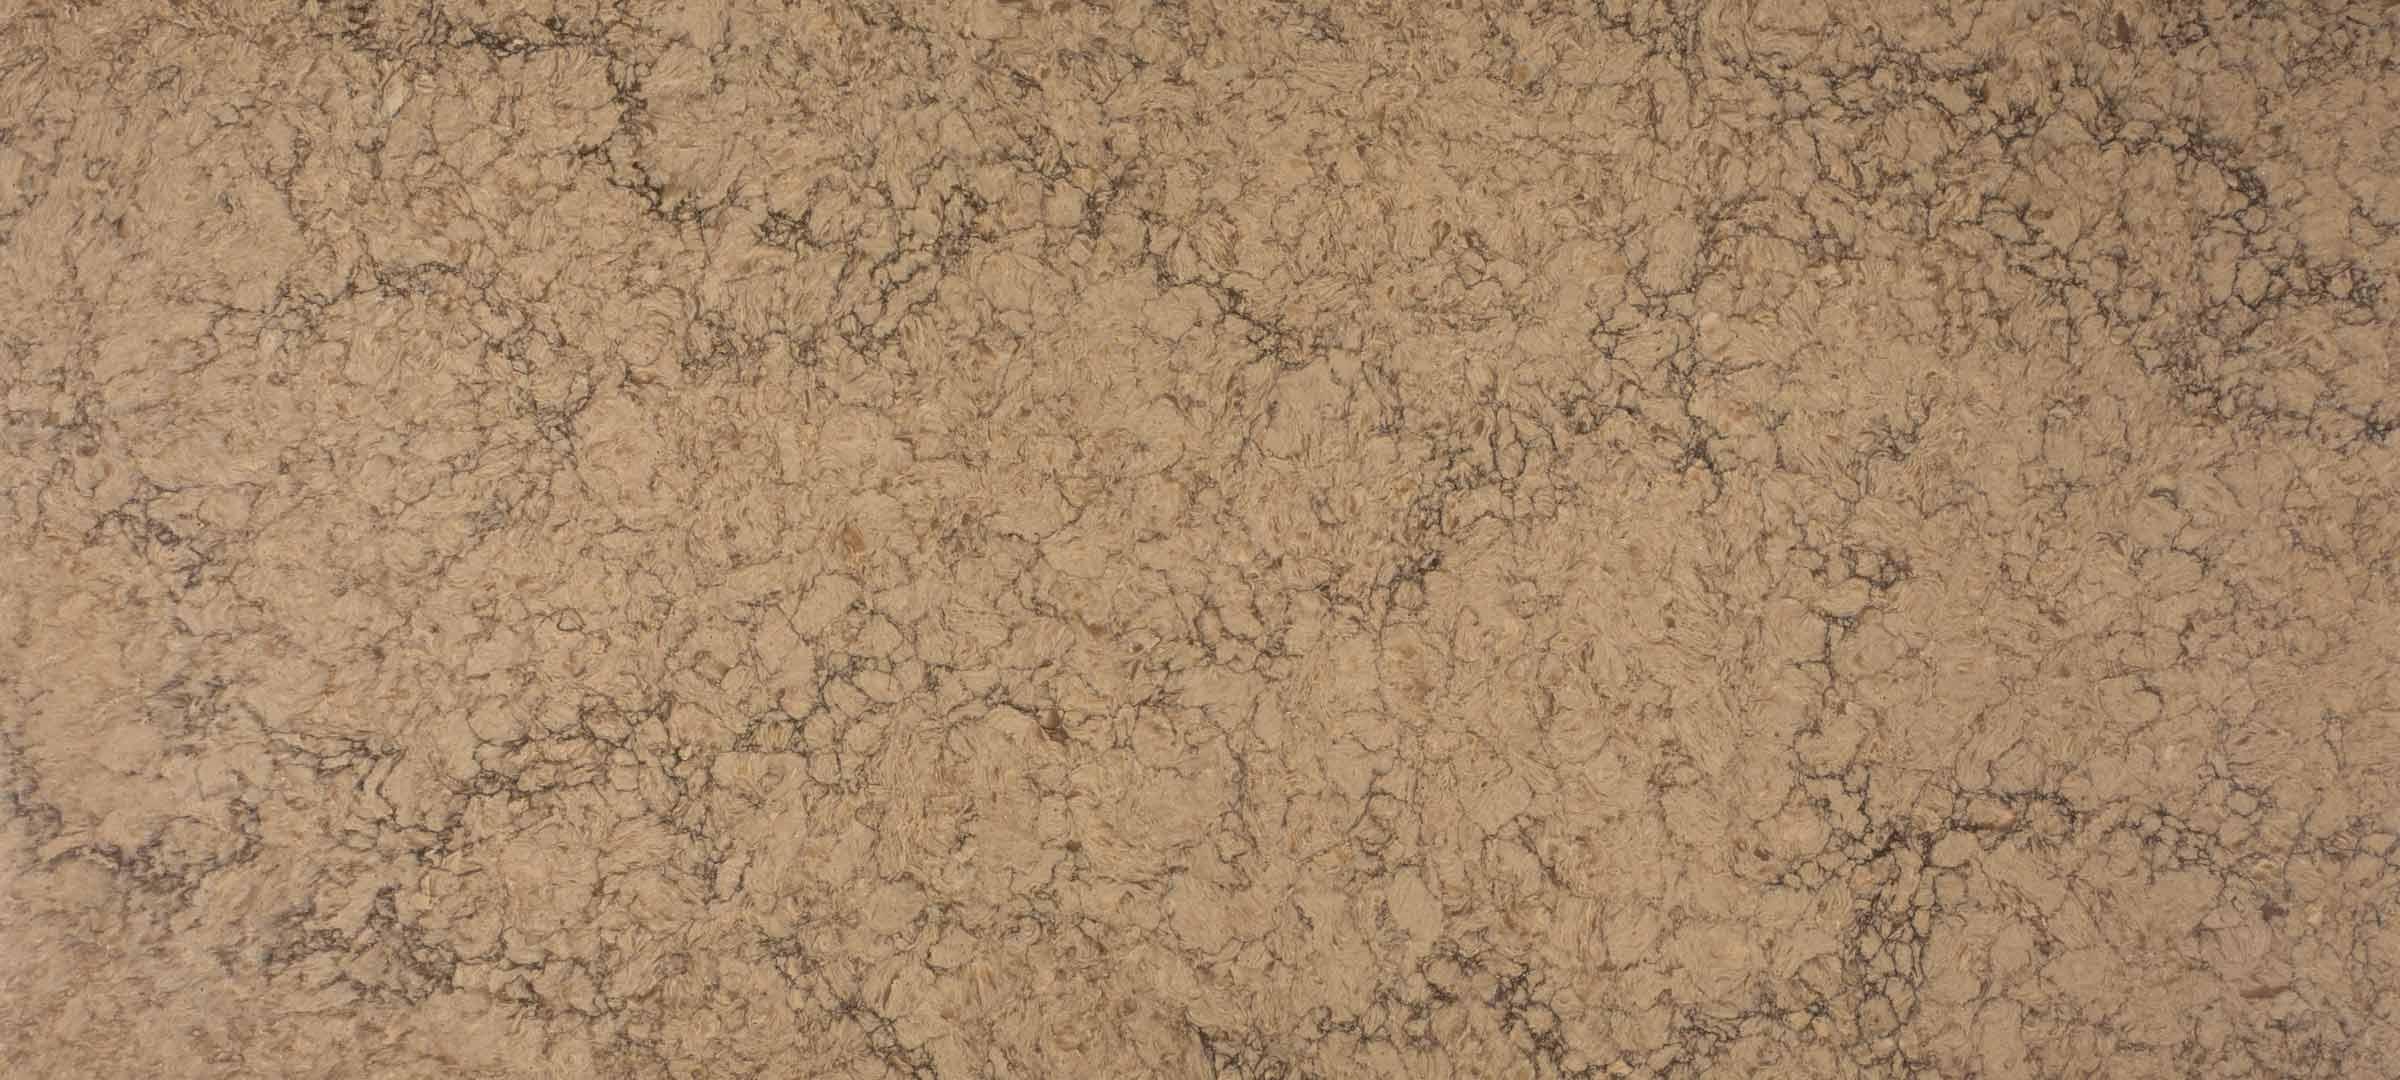 Caesarstone Quartz Gallery  Countertops  Slabs  St Charles MO